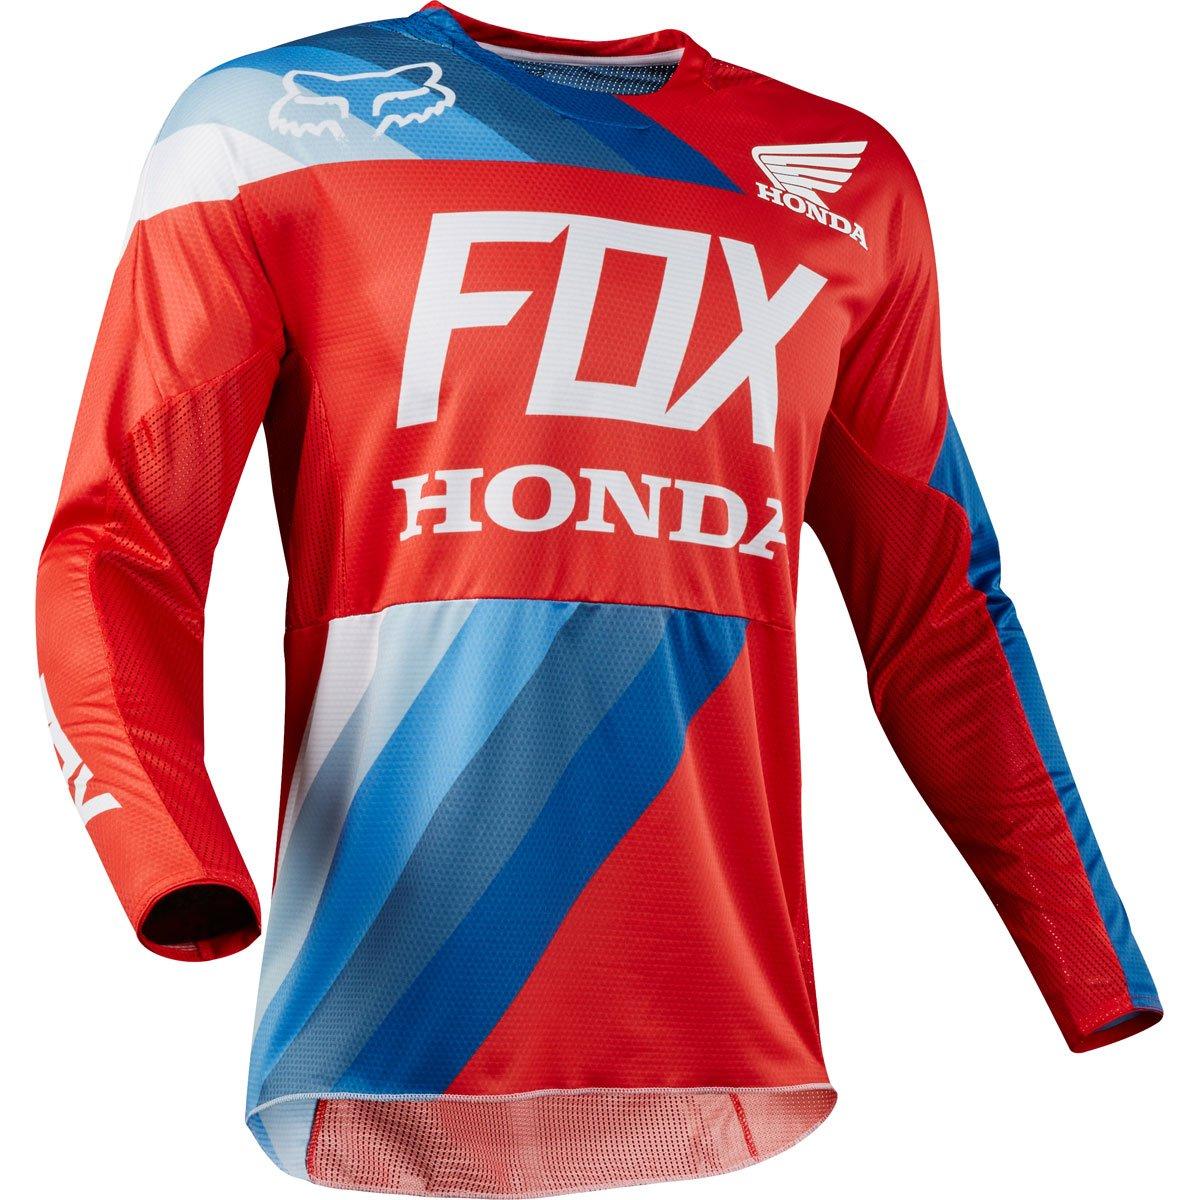 Fox Racing 2018 360 Honda Jersey-2XL by Fox Racing (Image #1)